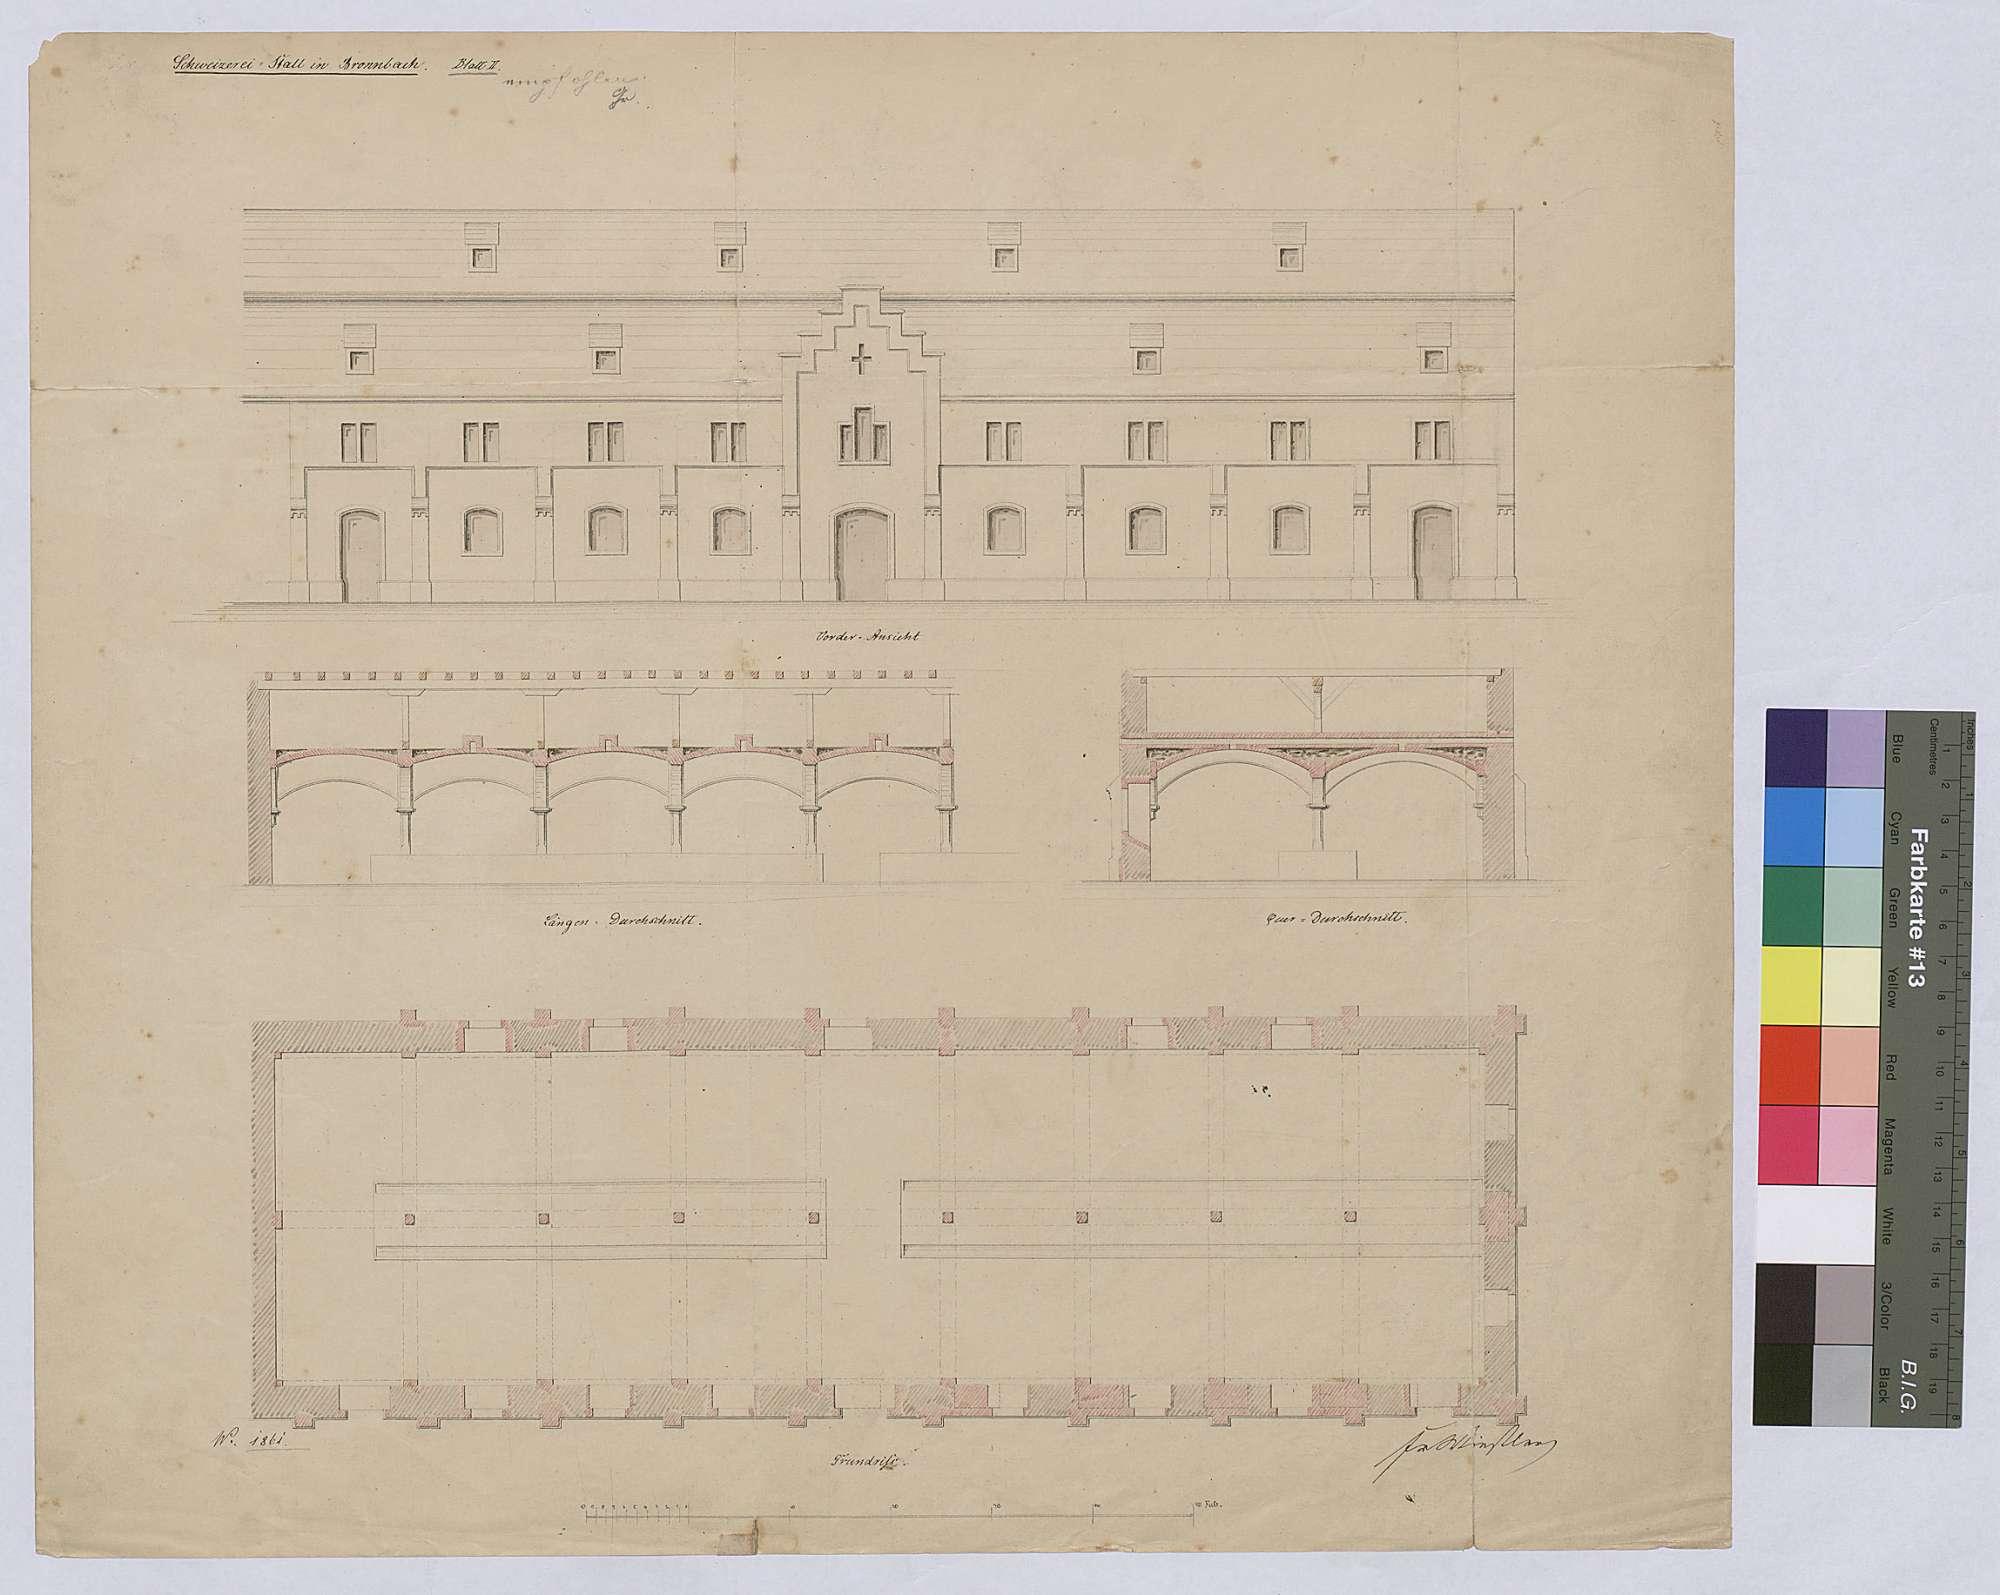 Schweizerei-Stall in Bronnbach, Blatt II, Bild 1